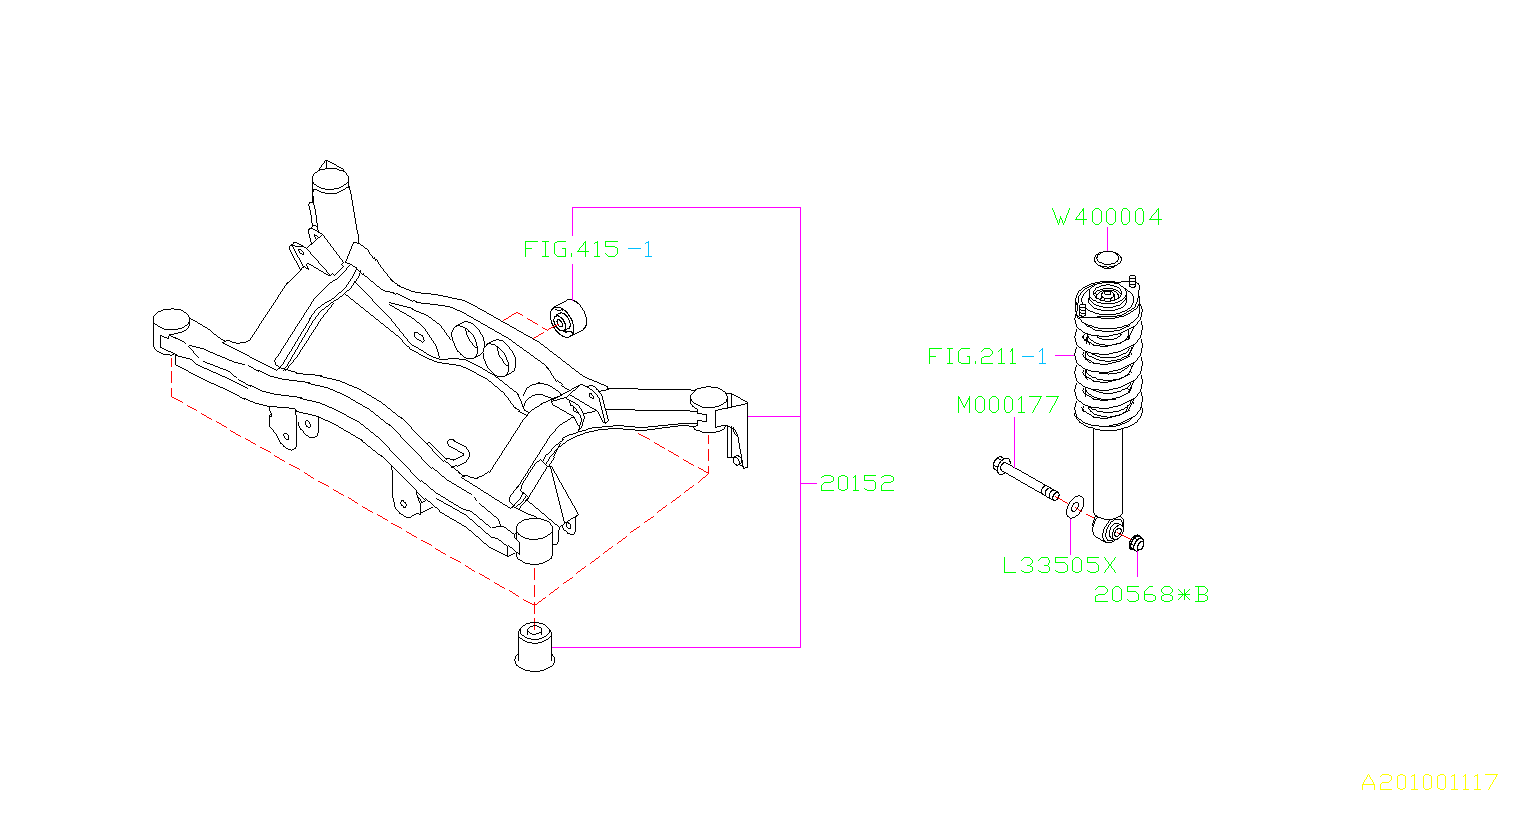 2001 subaru legacy frame sub assembly-rear suspension  brakes - 20152ae00b